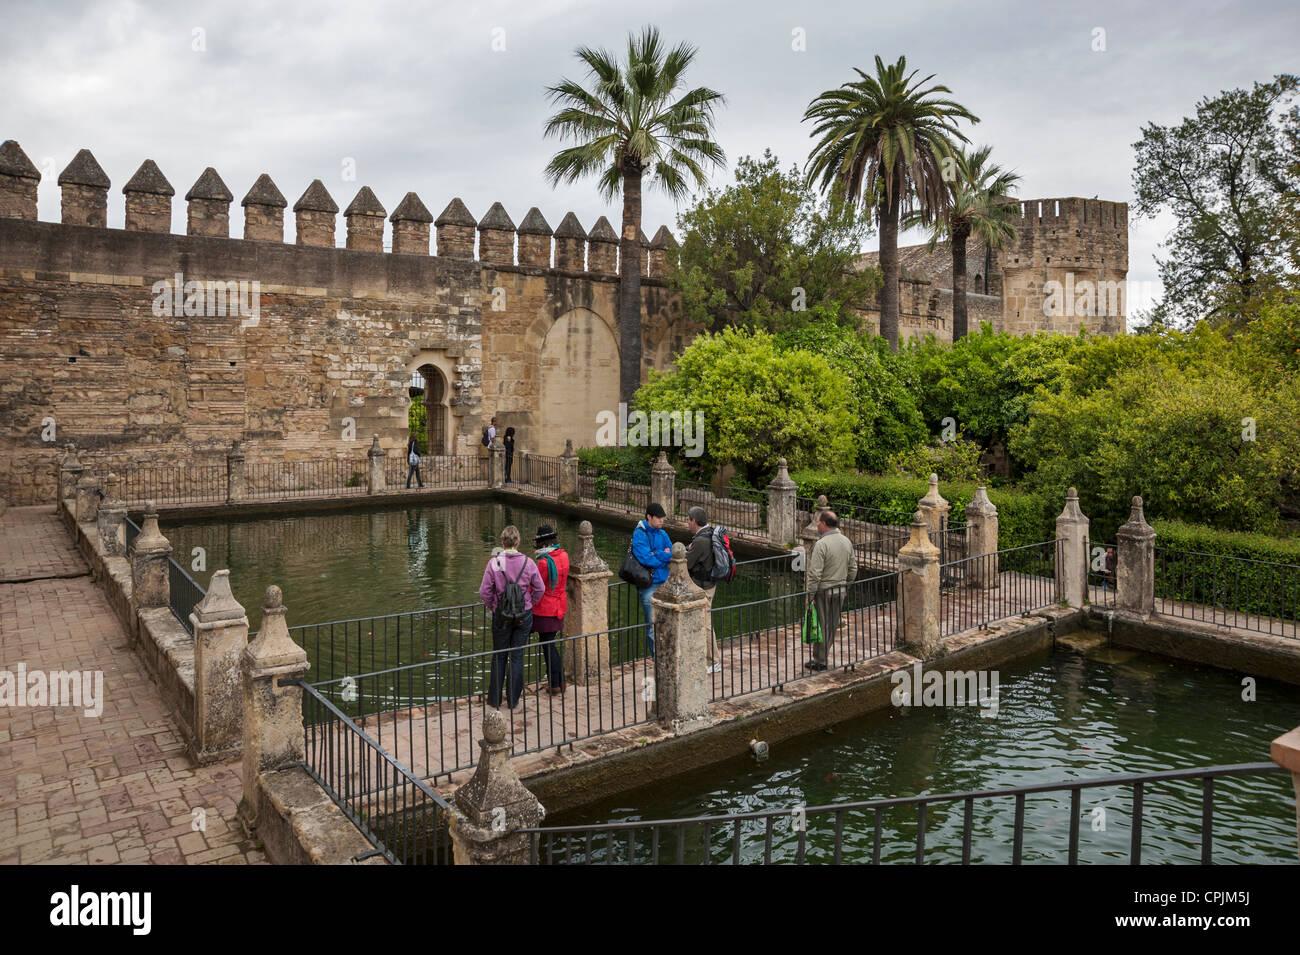 The Alcazar de los Reyes Cristianos Cordoba Andalusia Spain - Stock Image